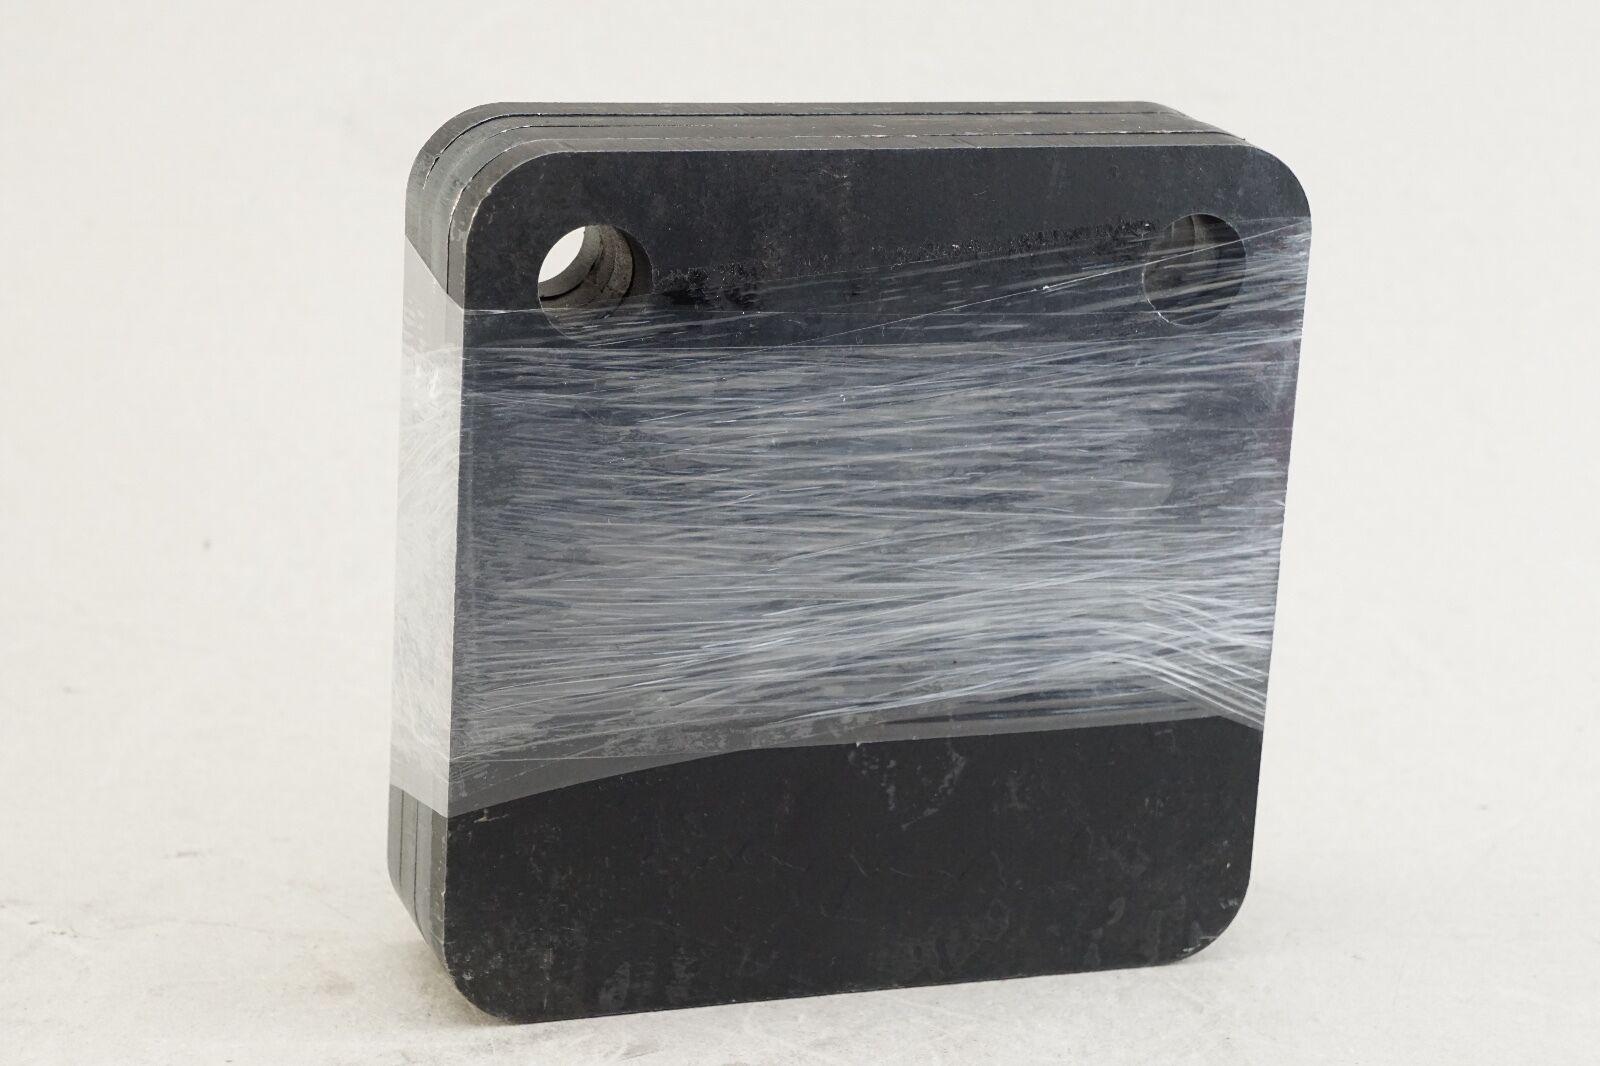 Nuevo paquete de 4 6  X 6  cuadrado de destino de Acero Negro AR500 Gong 3 8  agujeros de espesor de 3 4